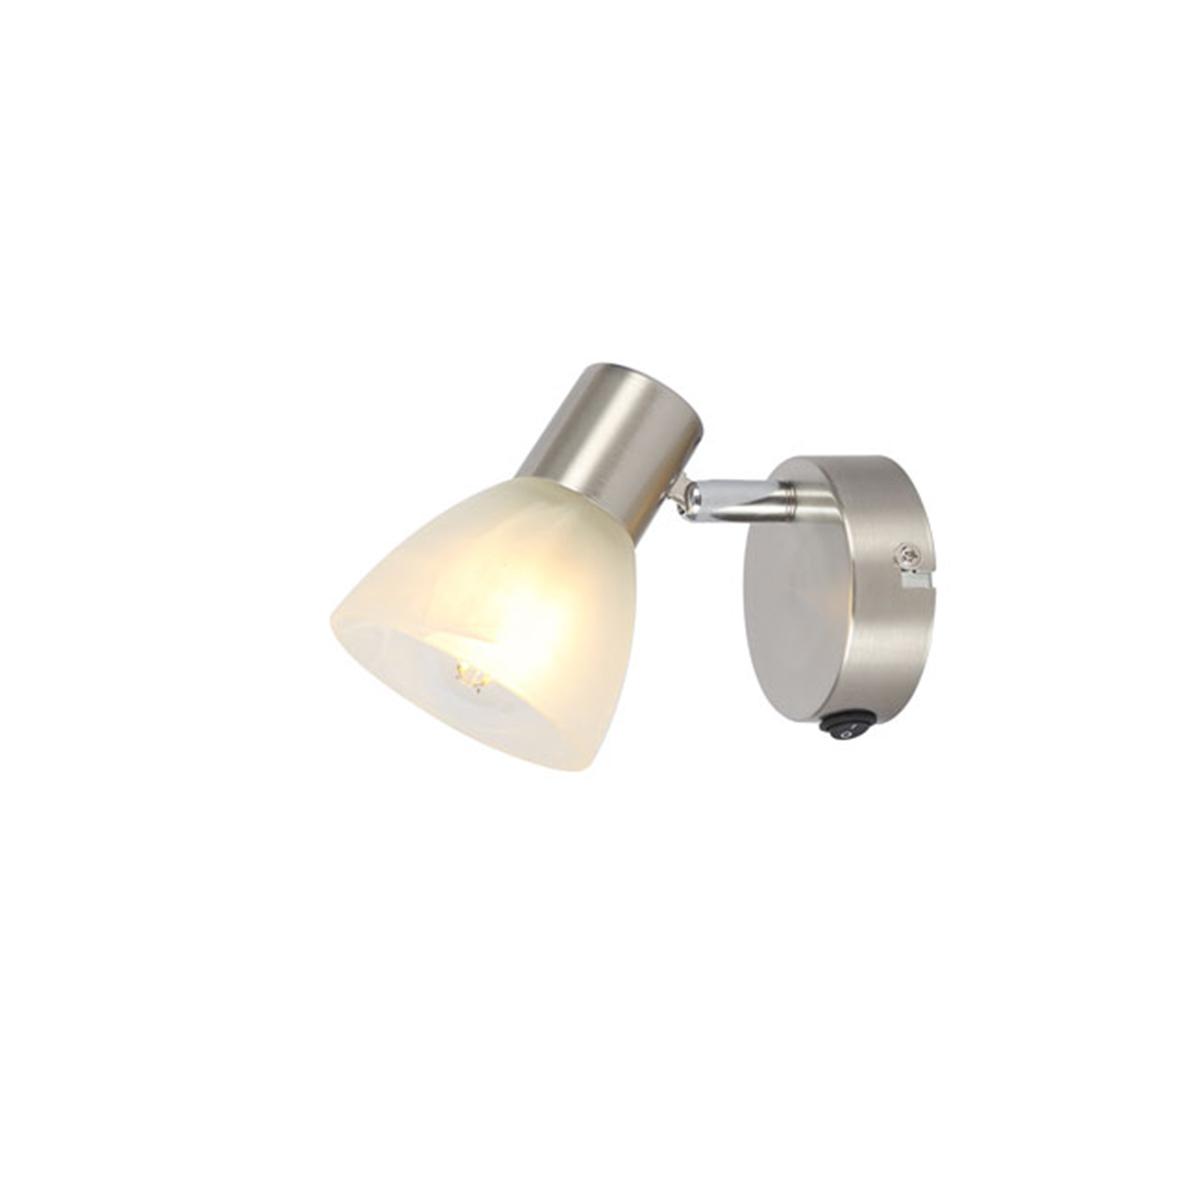 Spot lampa Vera/1 6602059